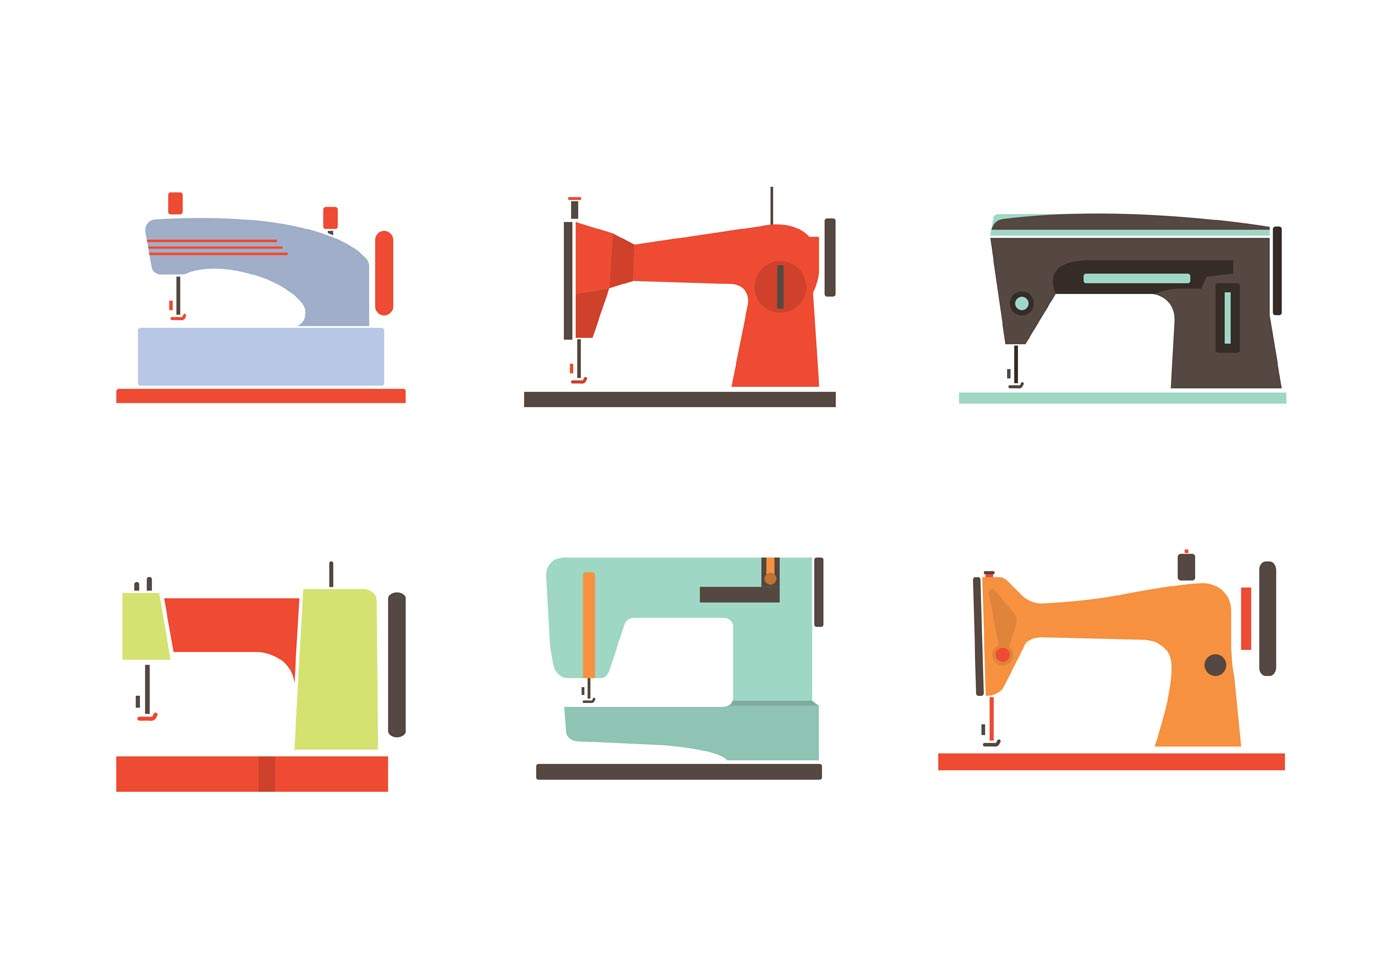 colorful vintage sewing machine vectors download free vector art stock graphics images. Black Bedroom Furniture Sets. Home Design Ideas